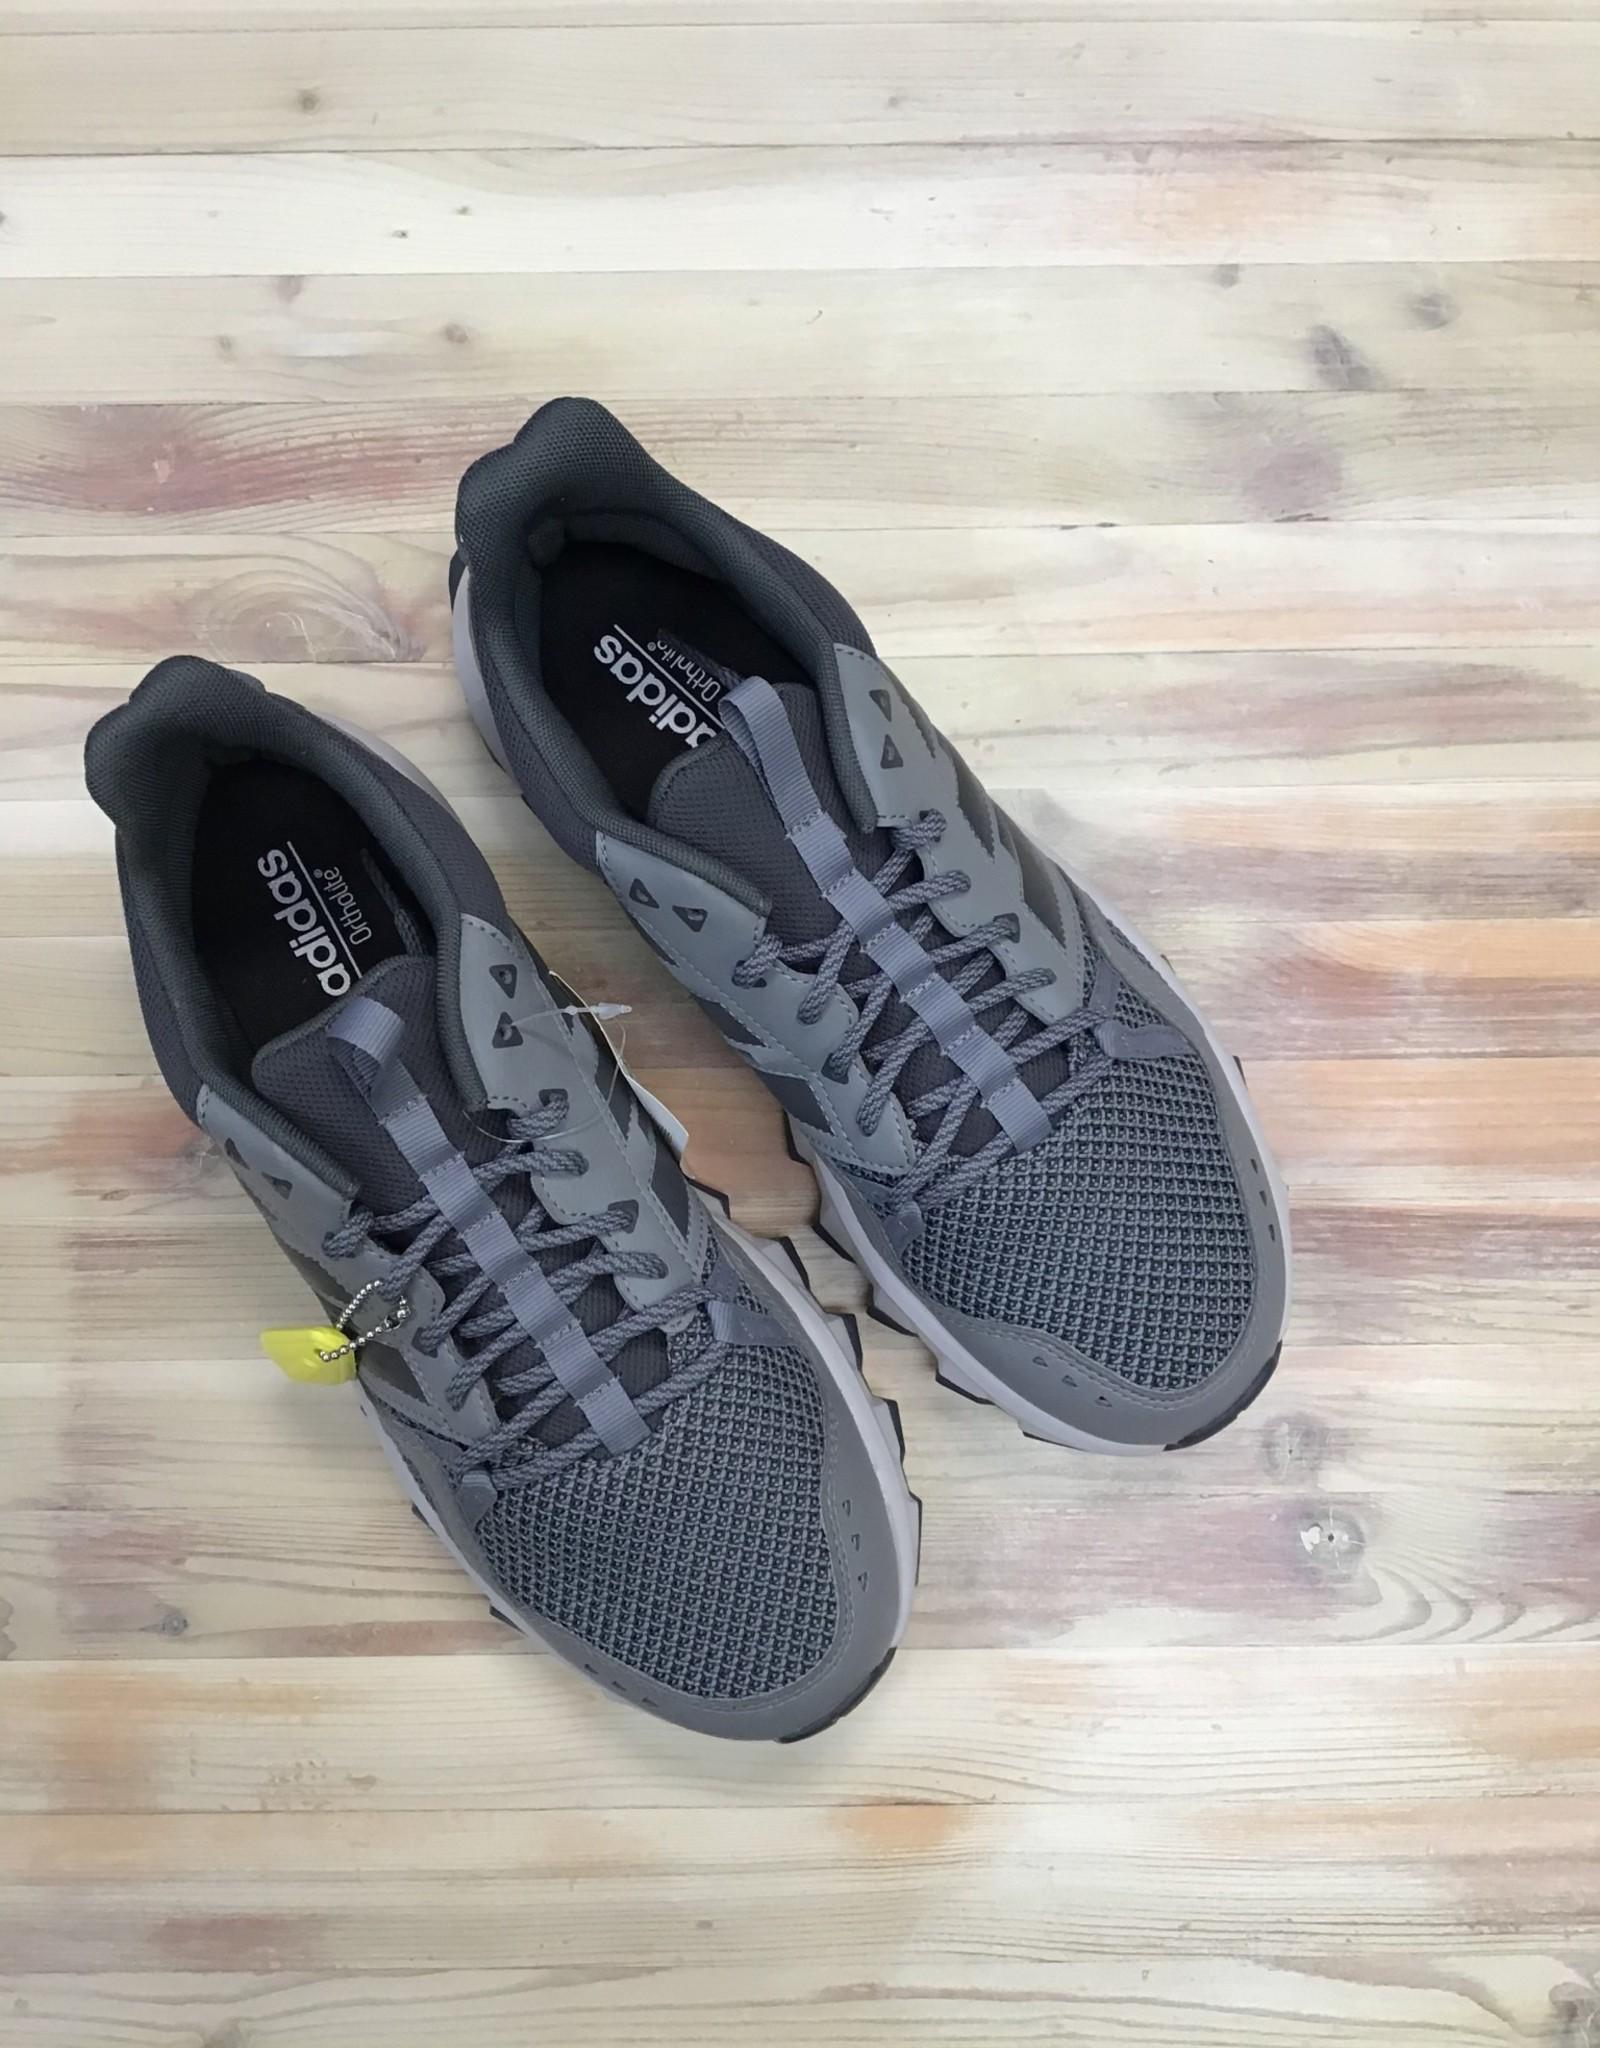 Adidas Adidas Rockadia Trail Men's